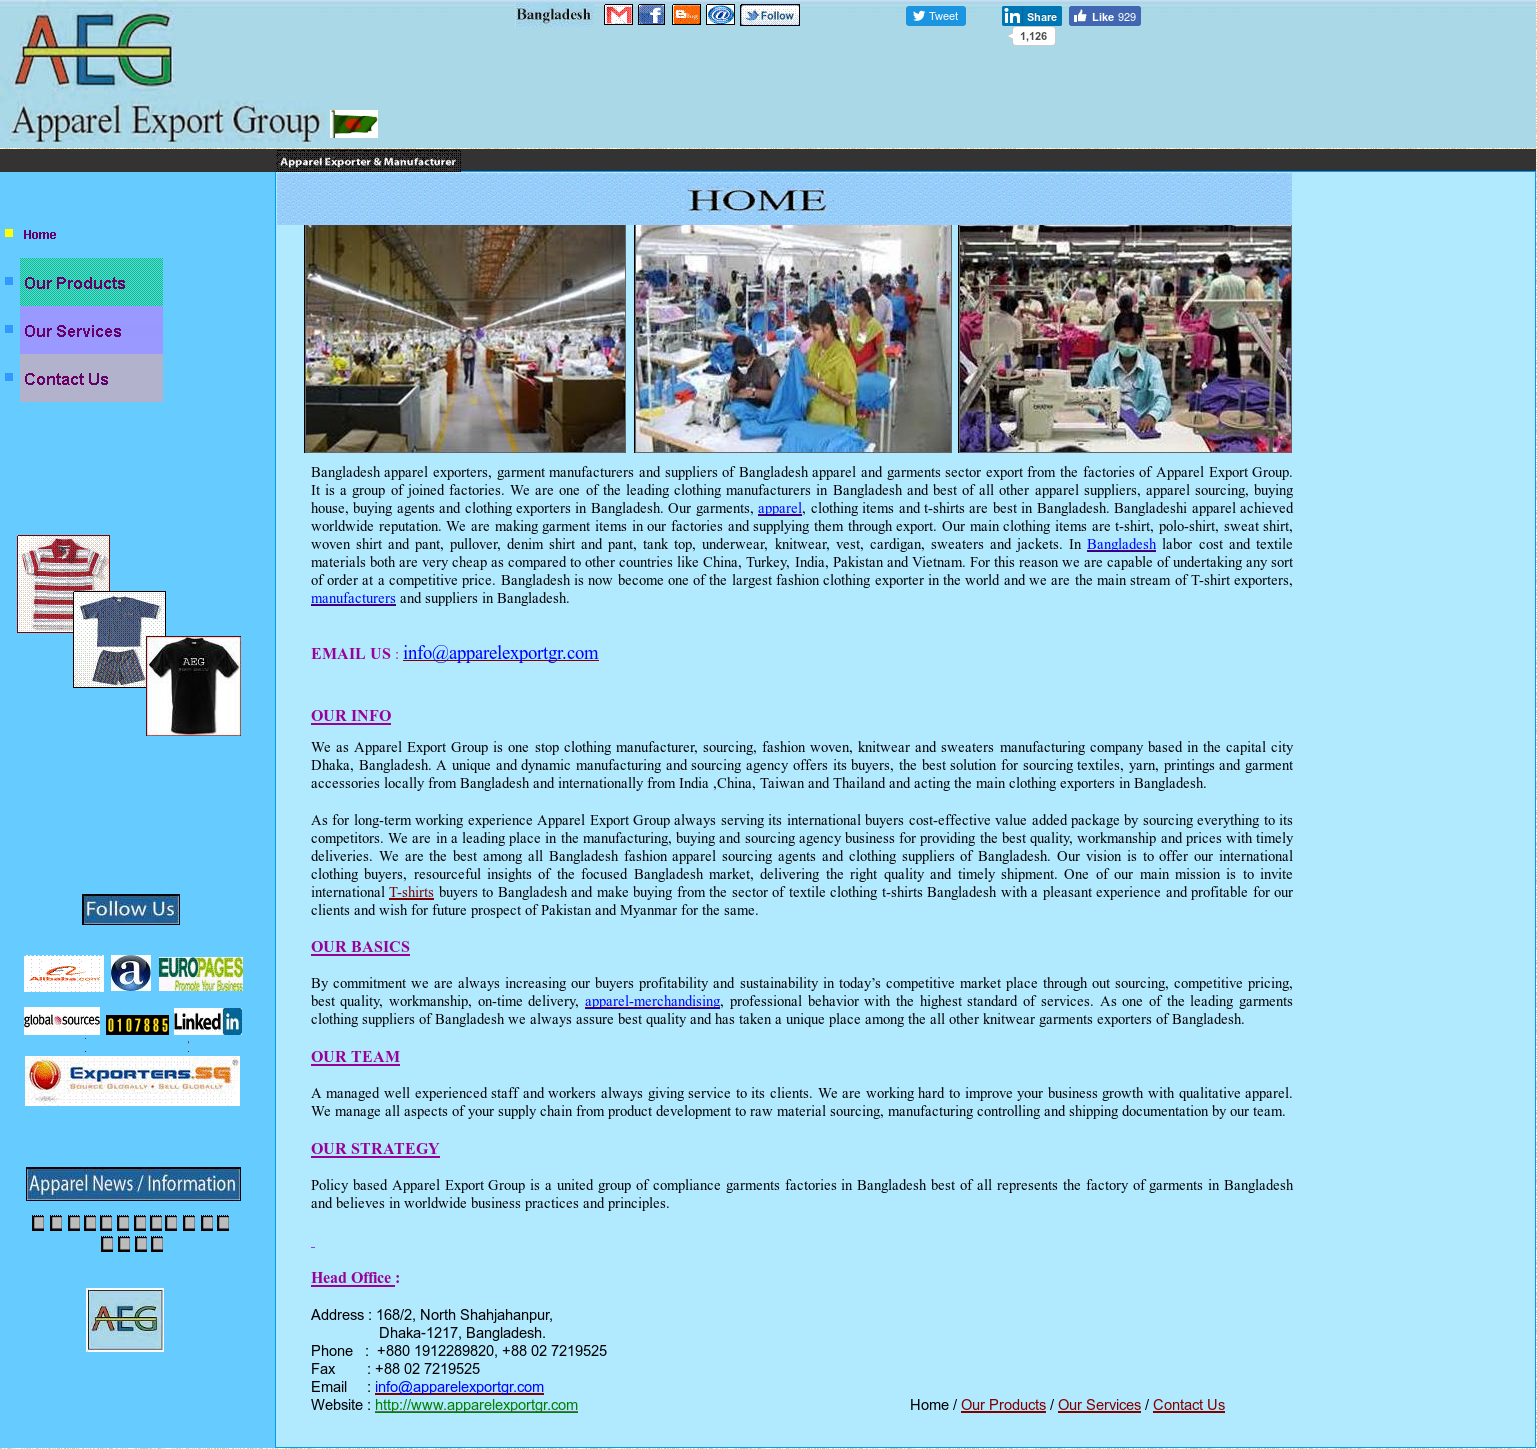 Bangladesh Apparel And Garments Manufacturers Competitors